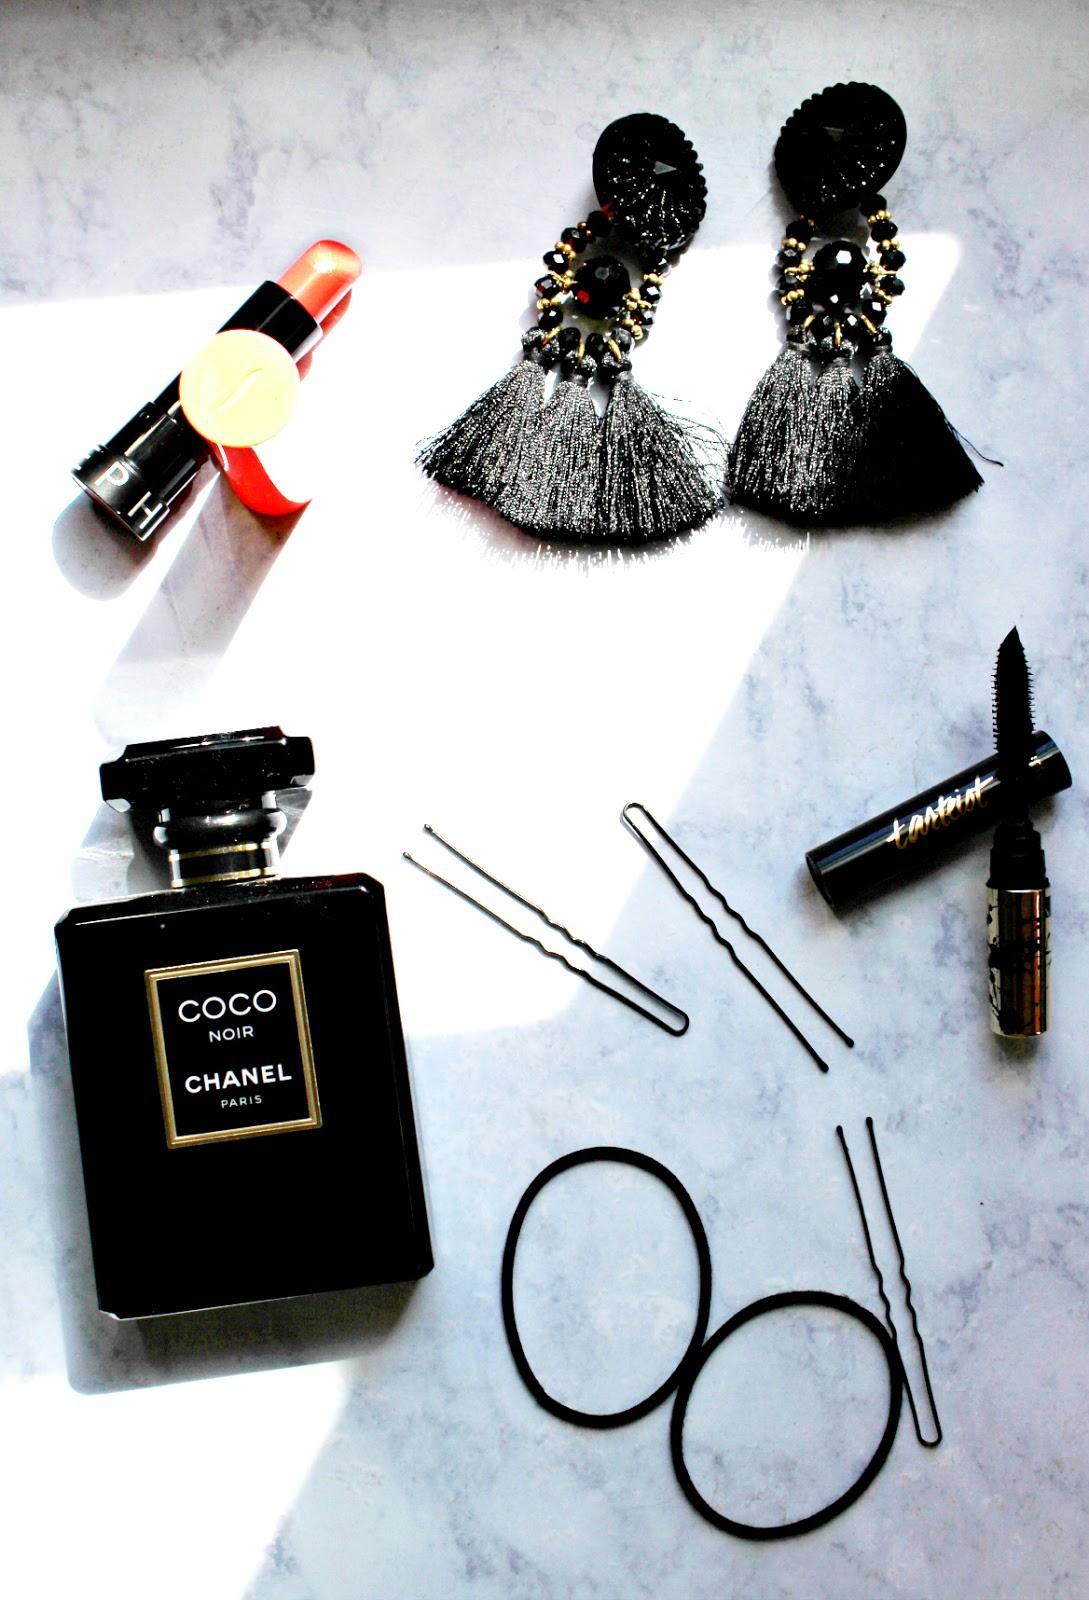 Chanel Coco Noir perfume flat lay